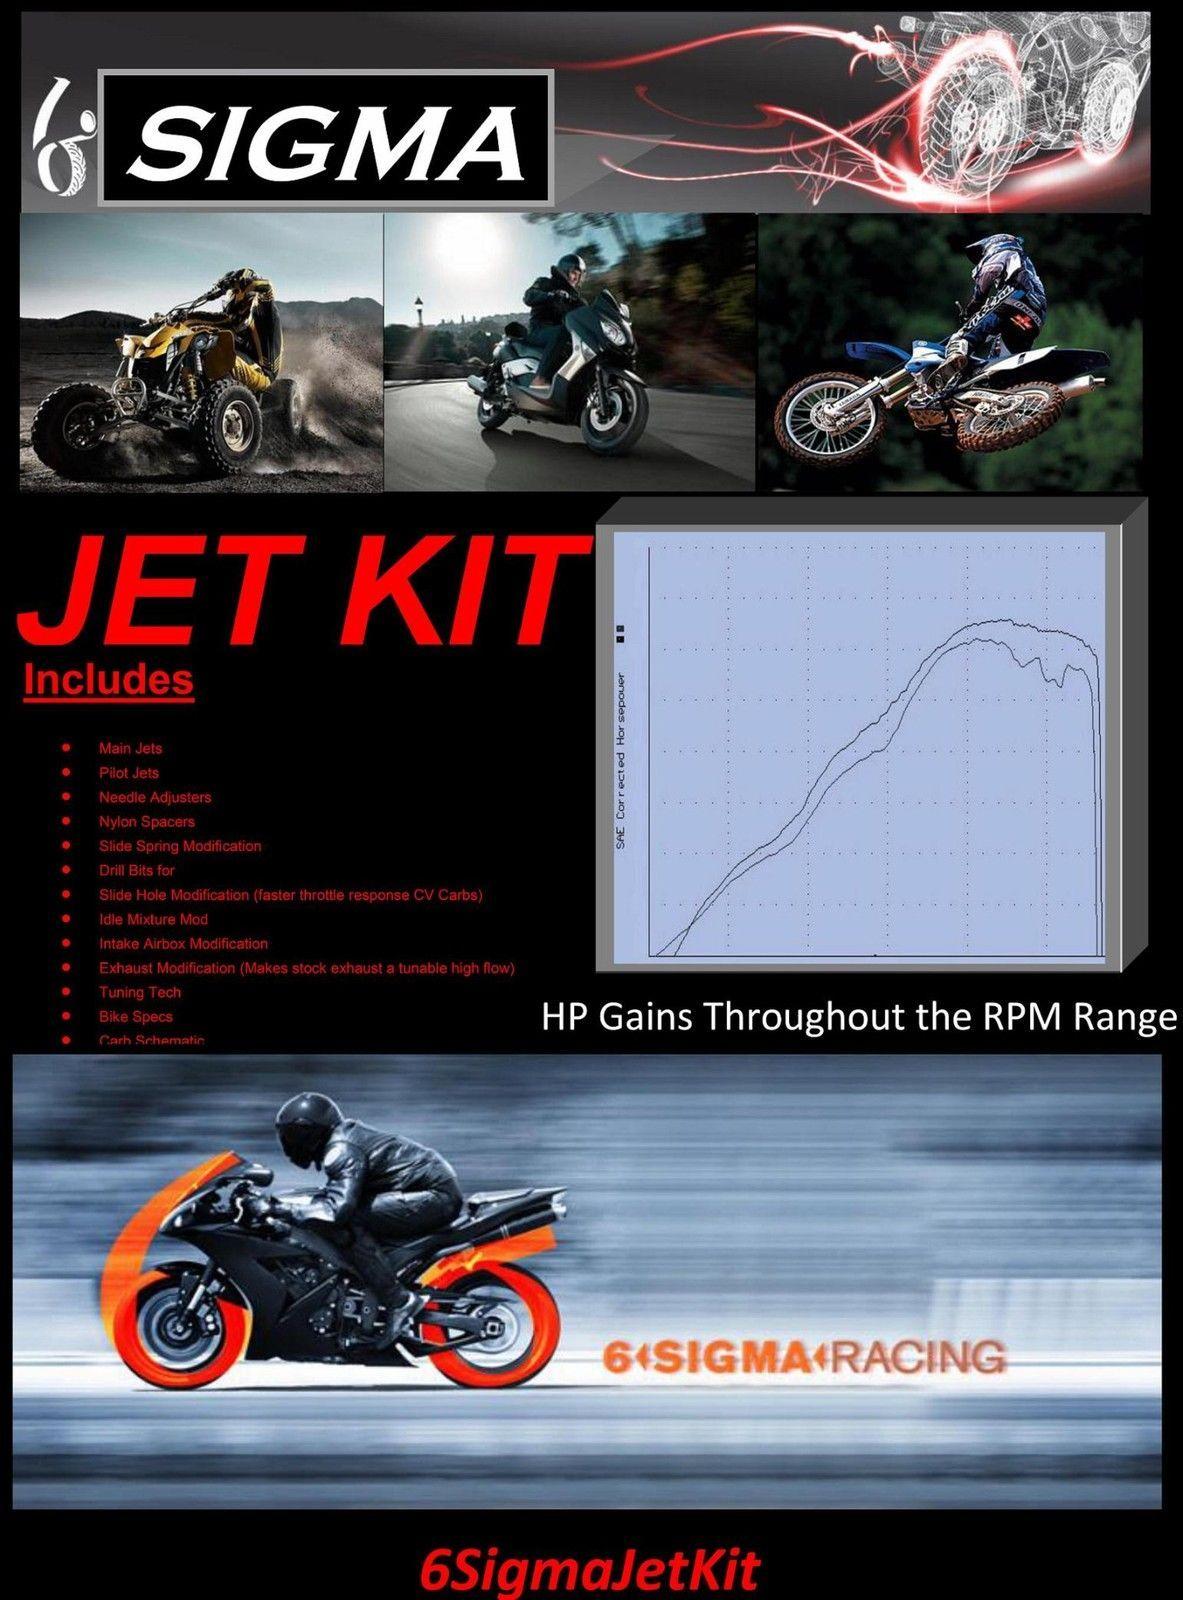 Lifan Huntaway 200 cc Trail Bike 6Sigma Custom Carburetor Carb Stage 1-3 Jet Kit